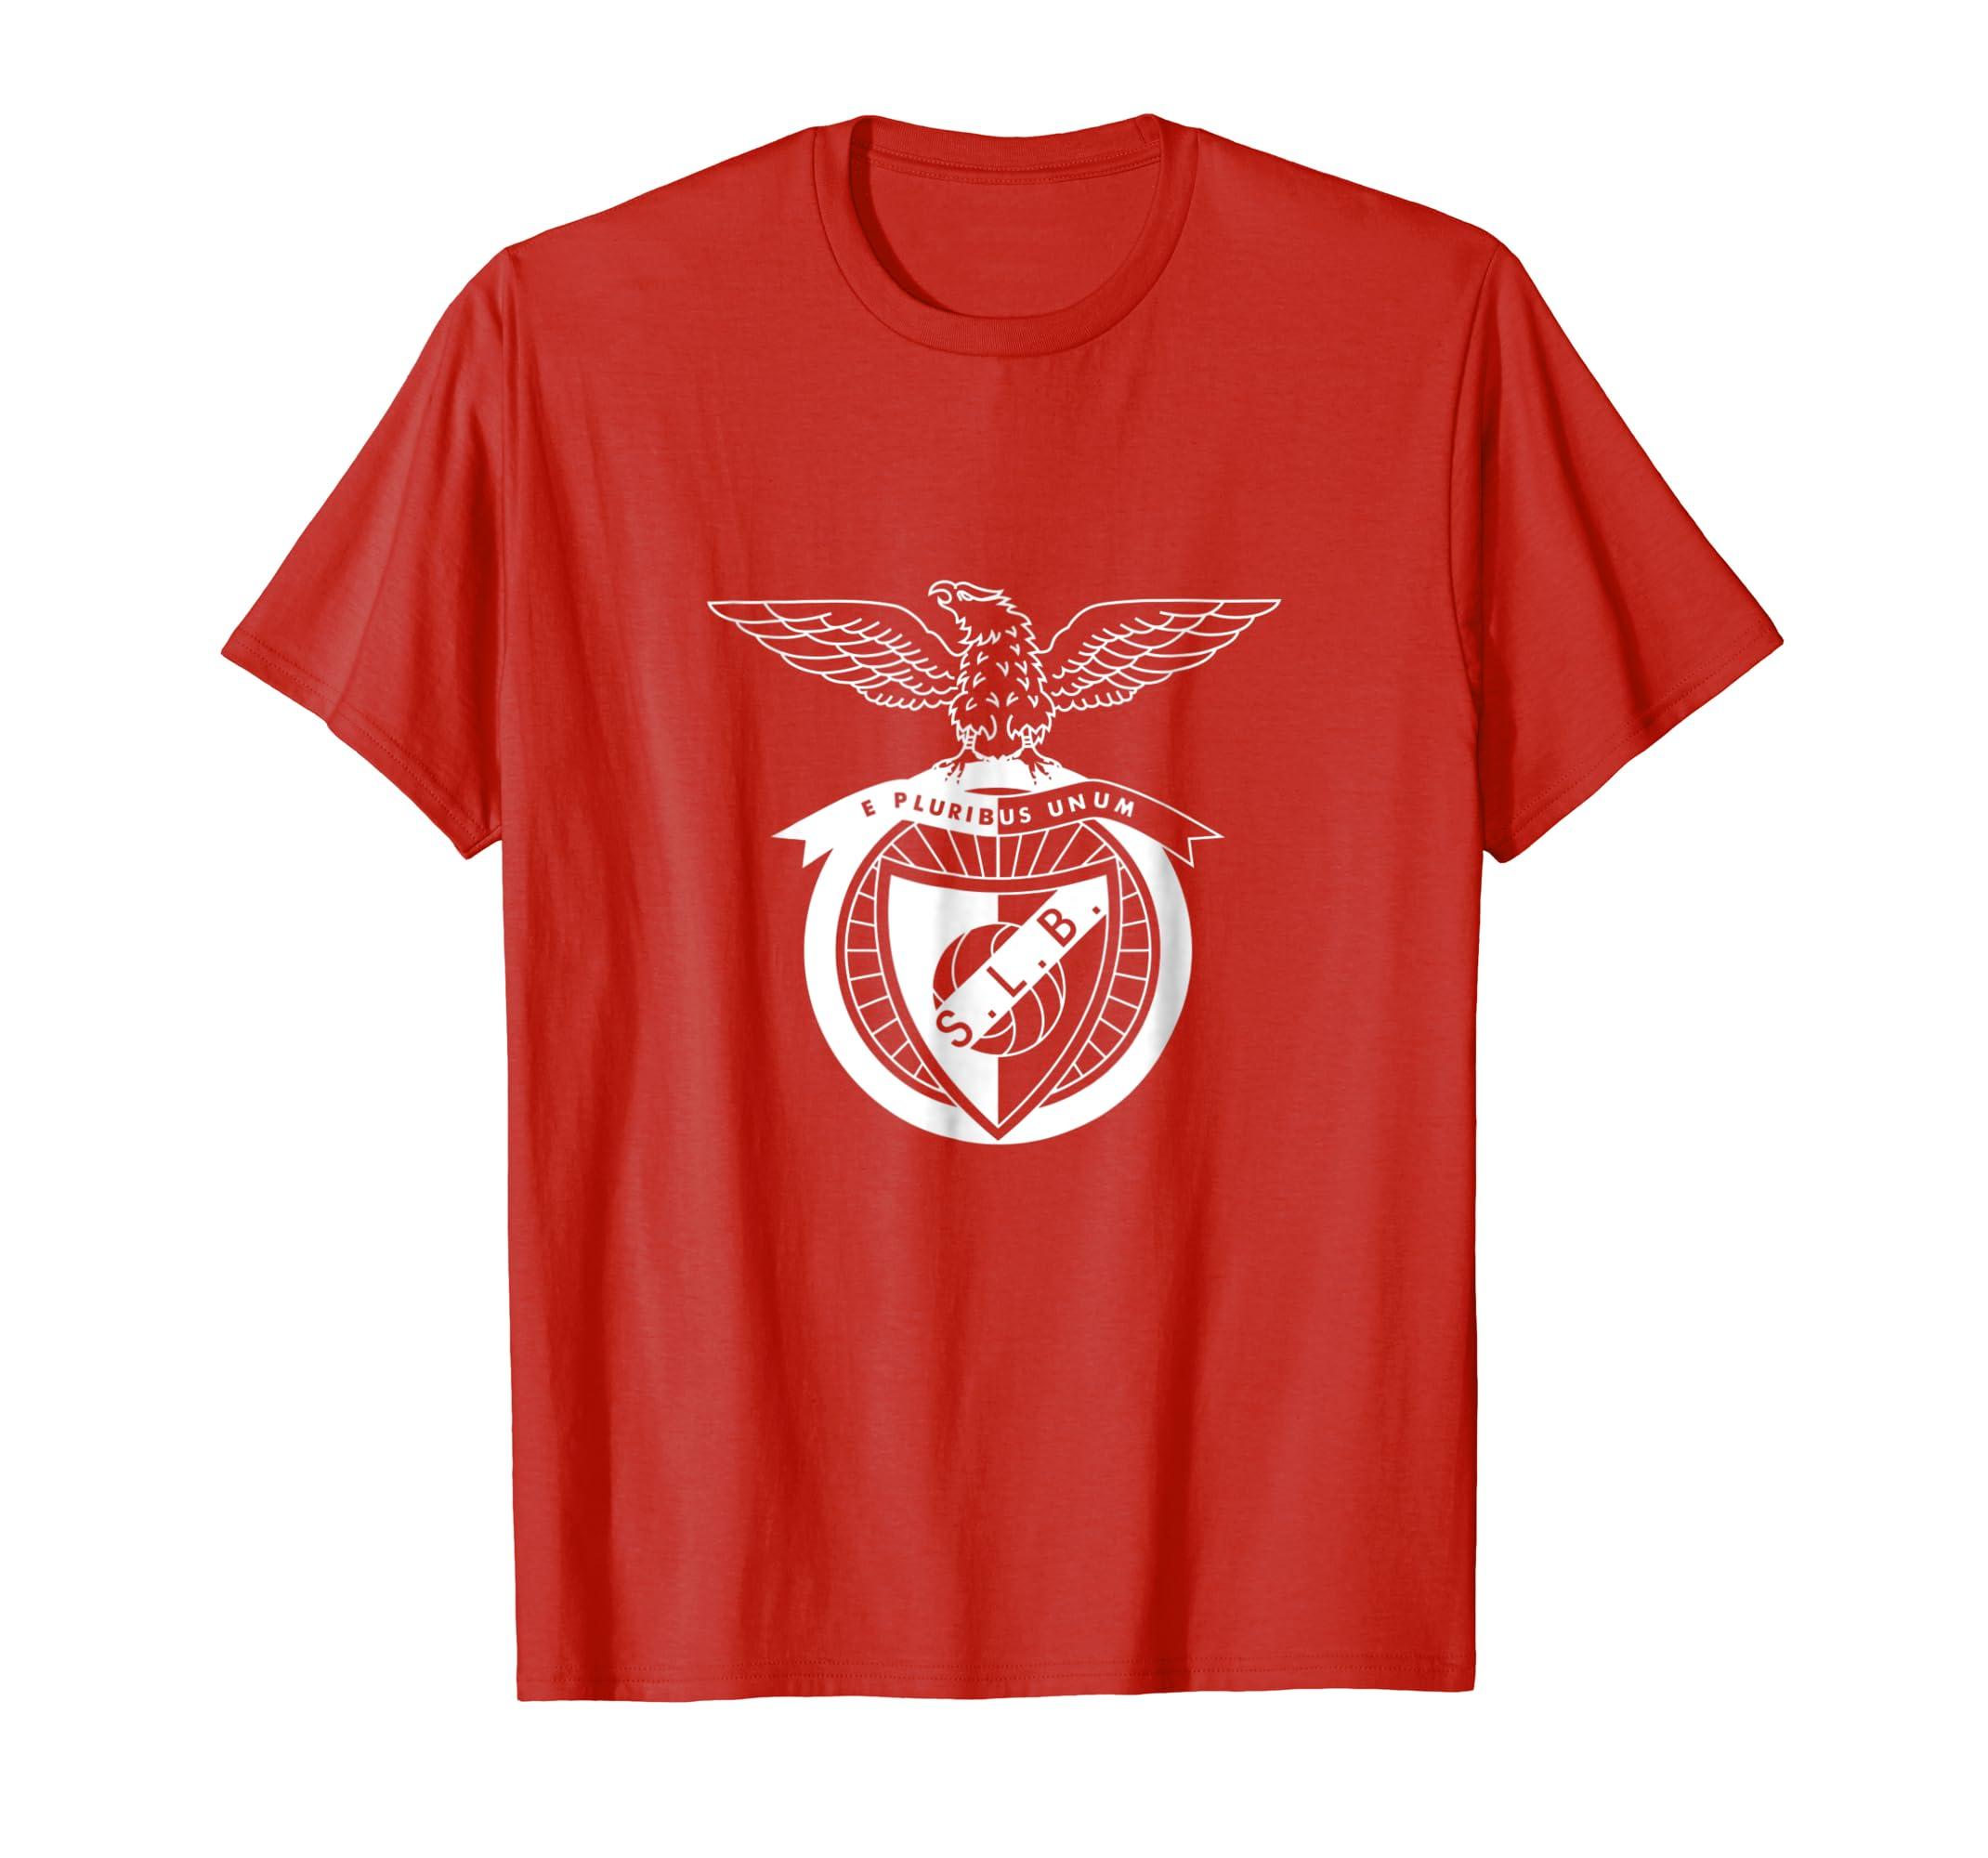 competitive price a2183 8b8a4 S.L. Benfica Aguias Portugal Lisboa TShirt Camisa Jersey-Teechatpro